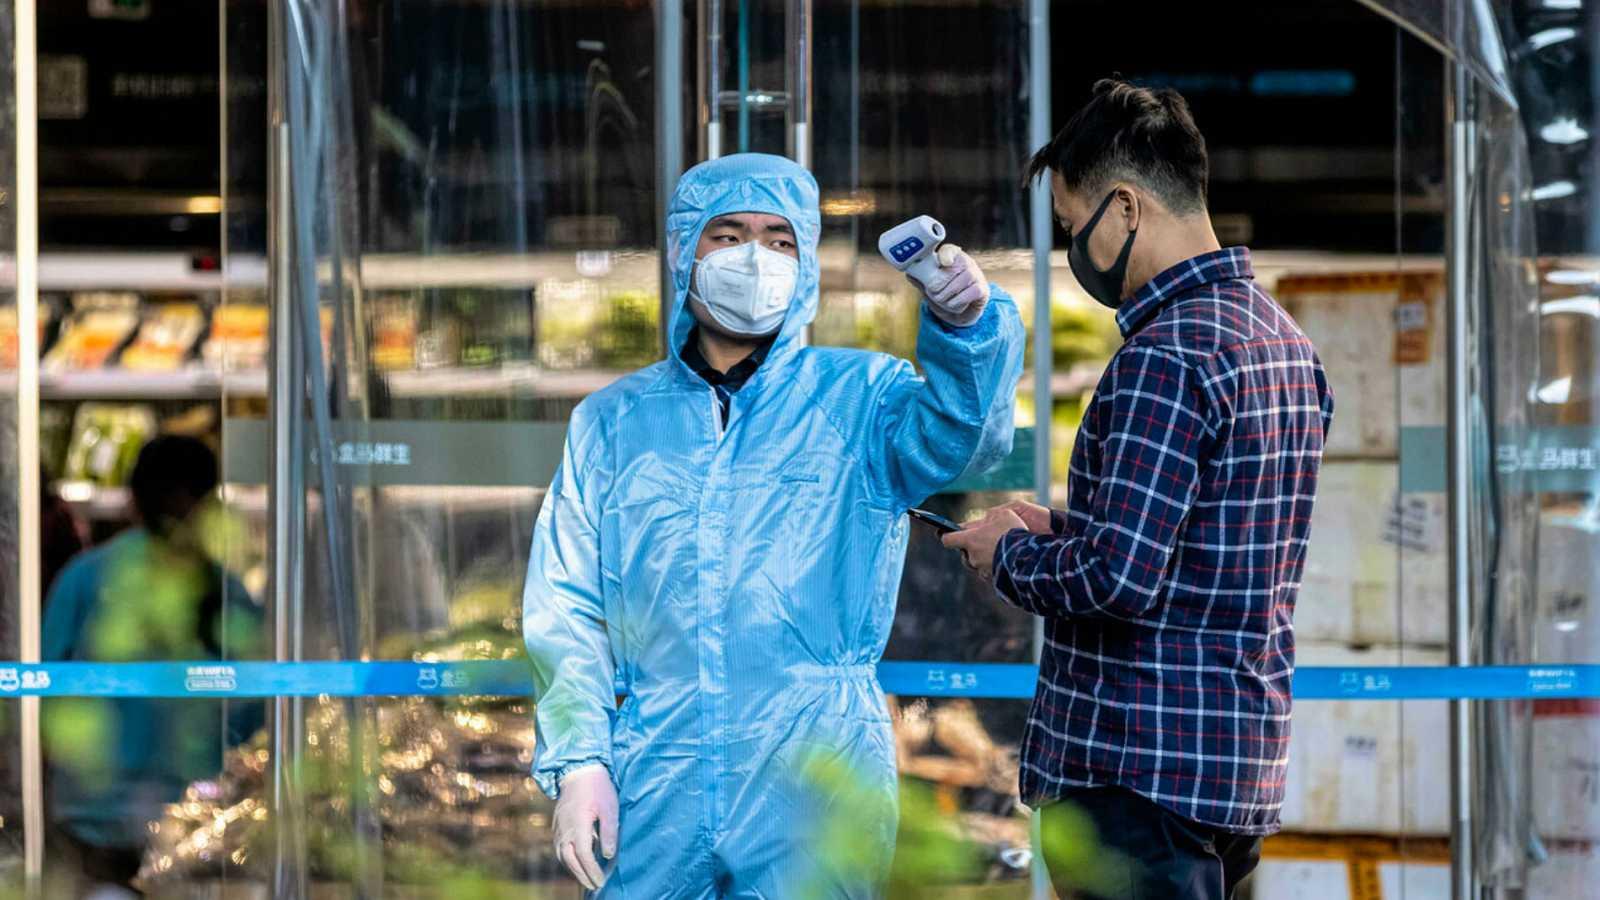 contagios, covid-19, China, segunda ola, pandemia, internacional